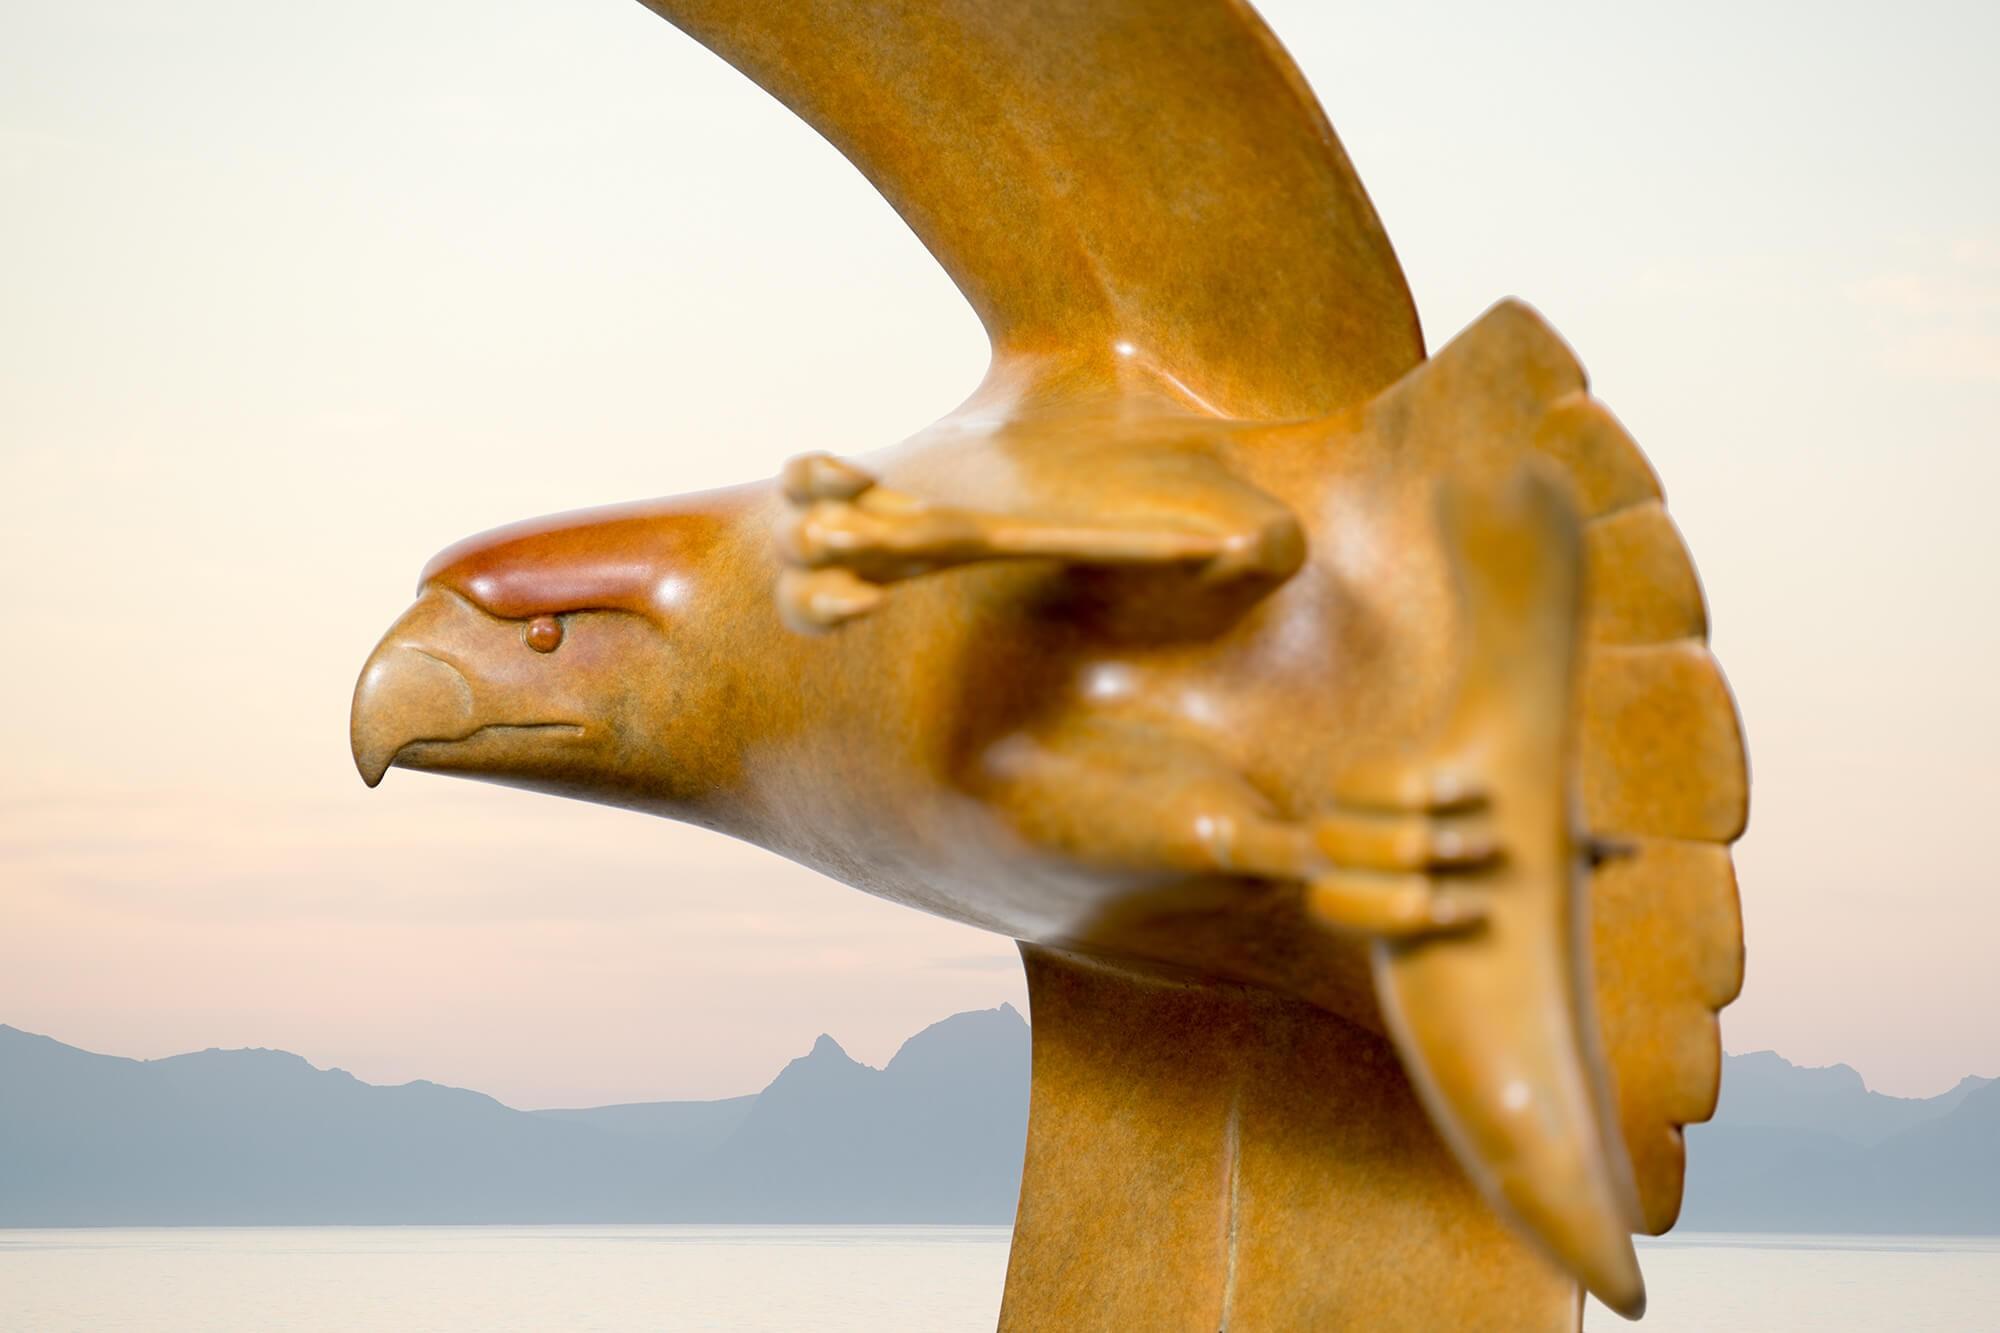 Roofvogel met vis no.4